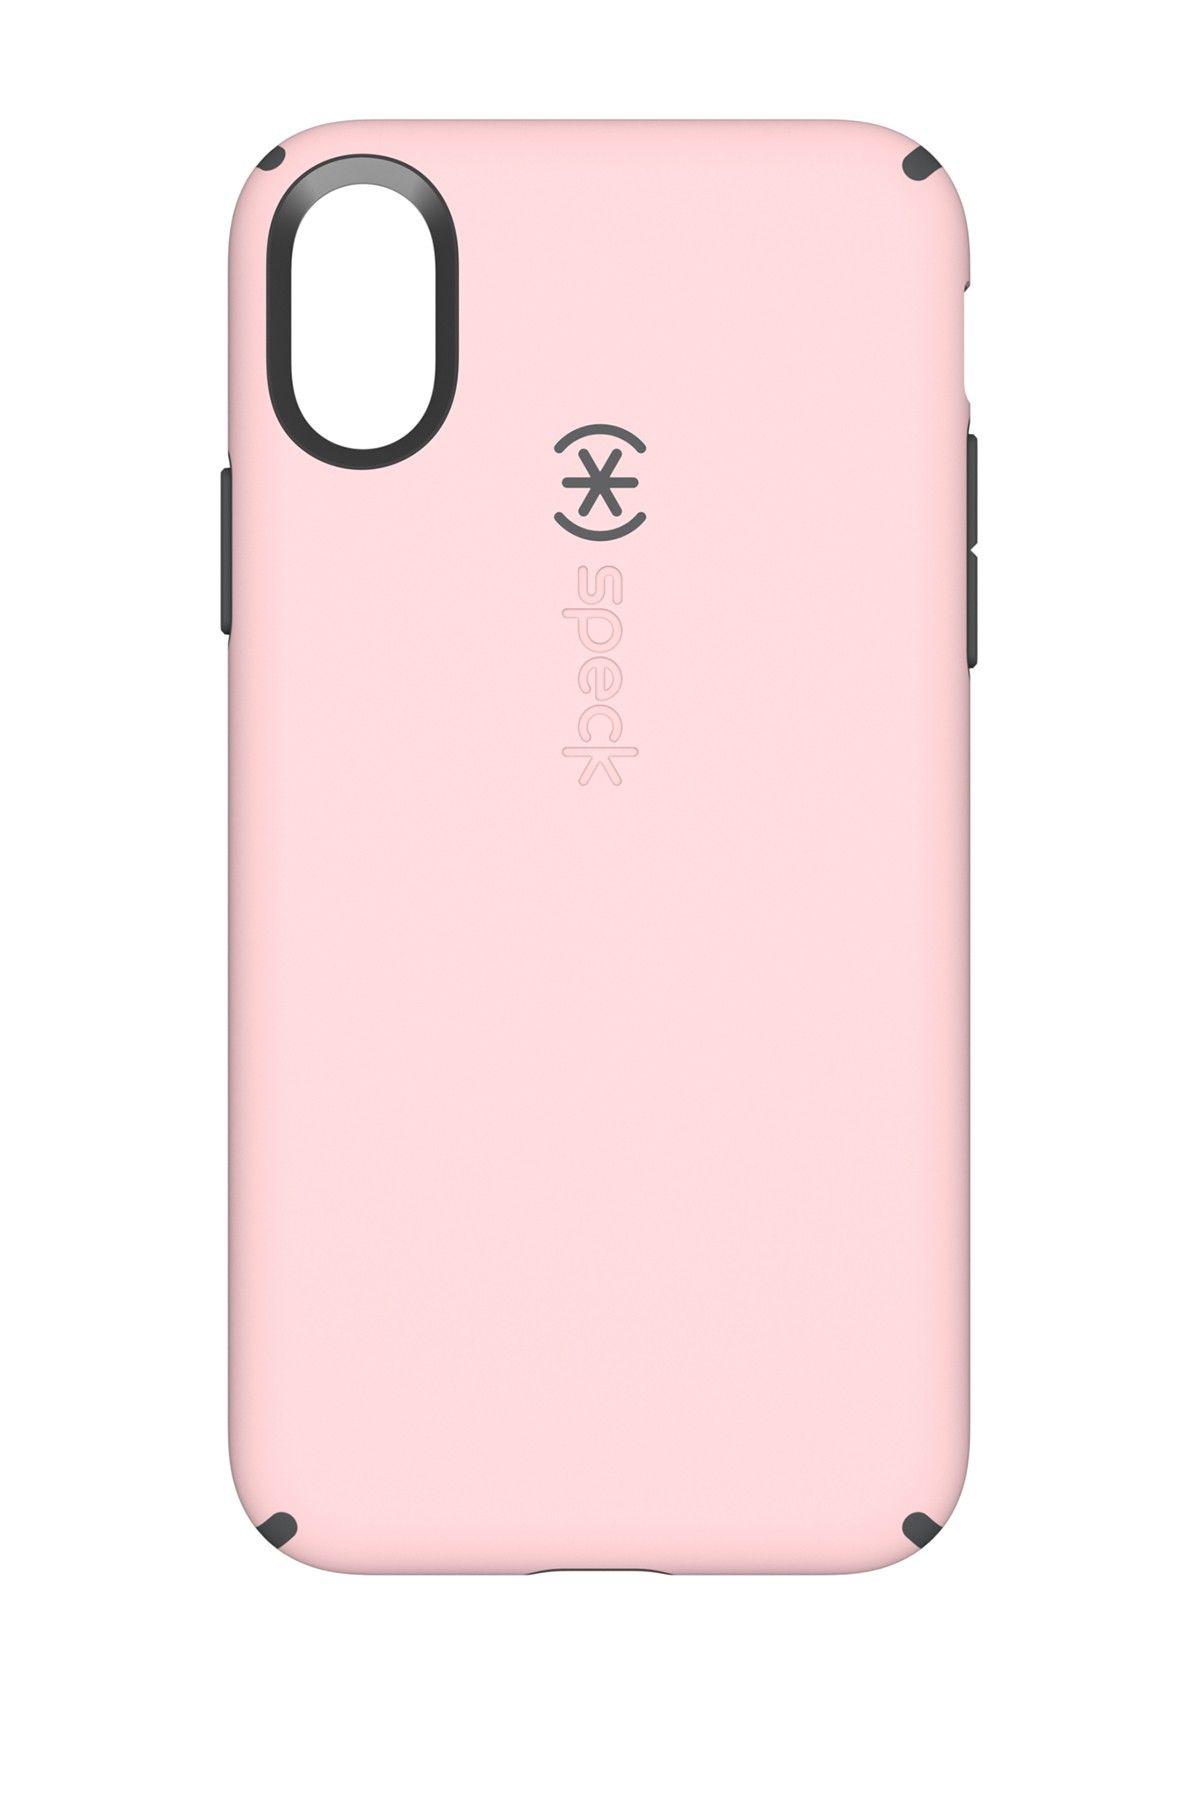 big sale b9de8 6bed9 Quartz PinkSlate Grey iPhone X Candyshell Case | Shop the look ...